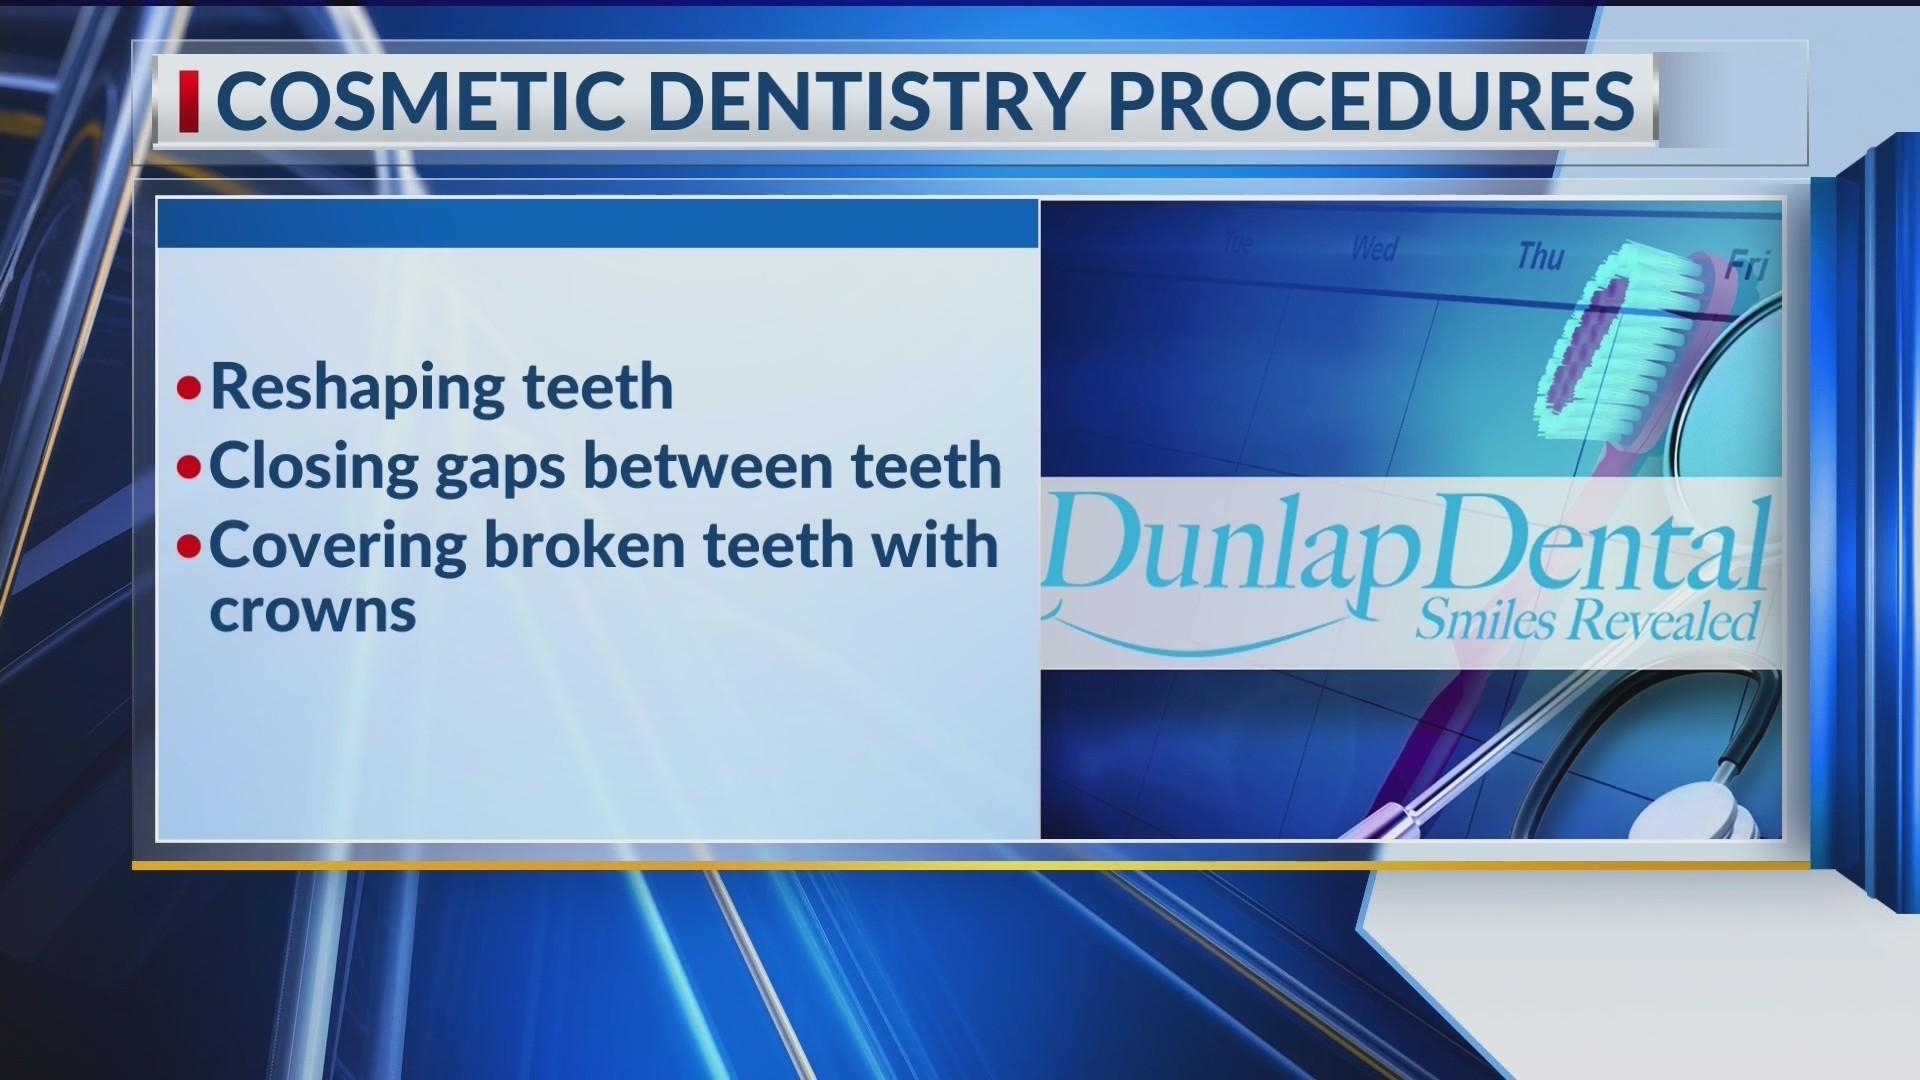 Dunlap_Dental_Cosmetic_Procedures_0_20190110205224